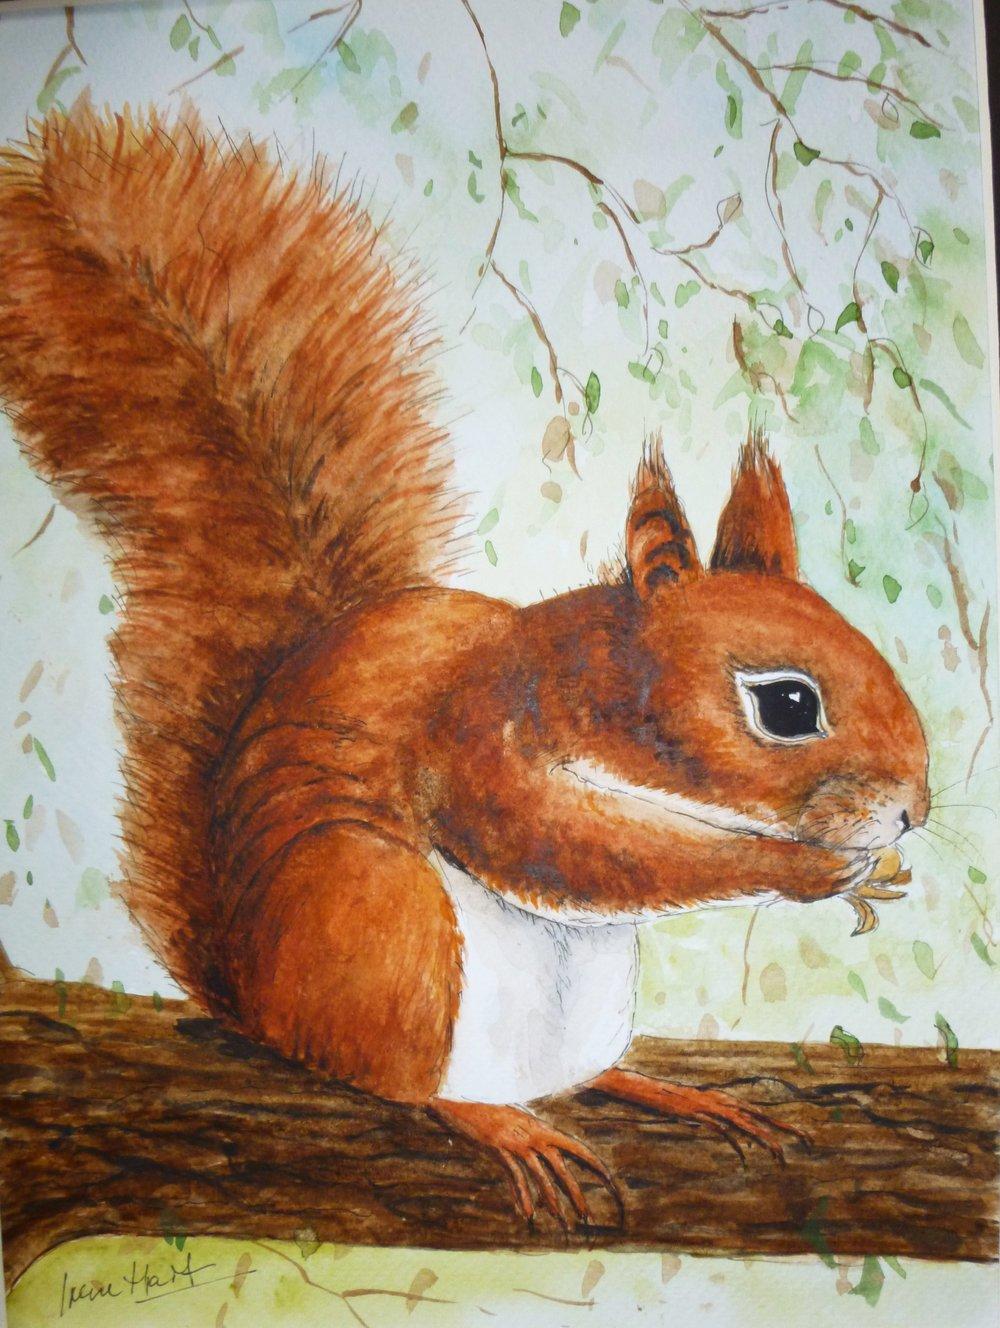 230 Red Squirrel.JPG